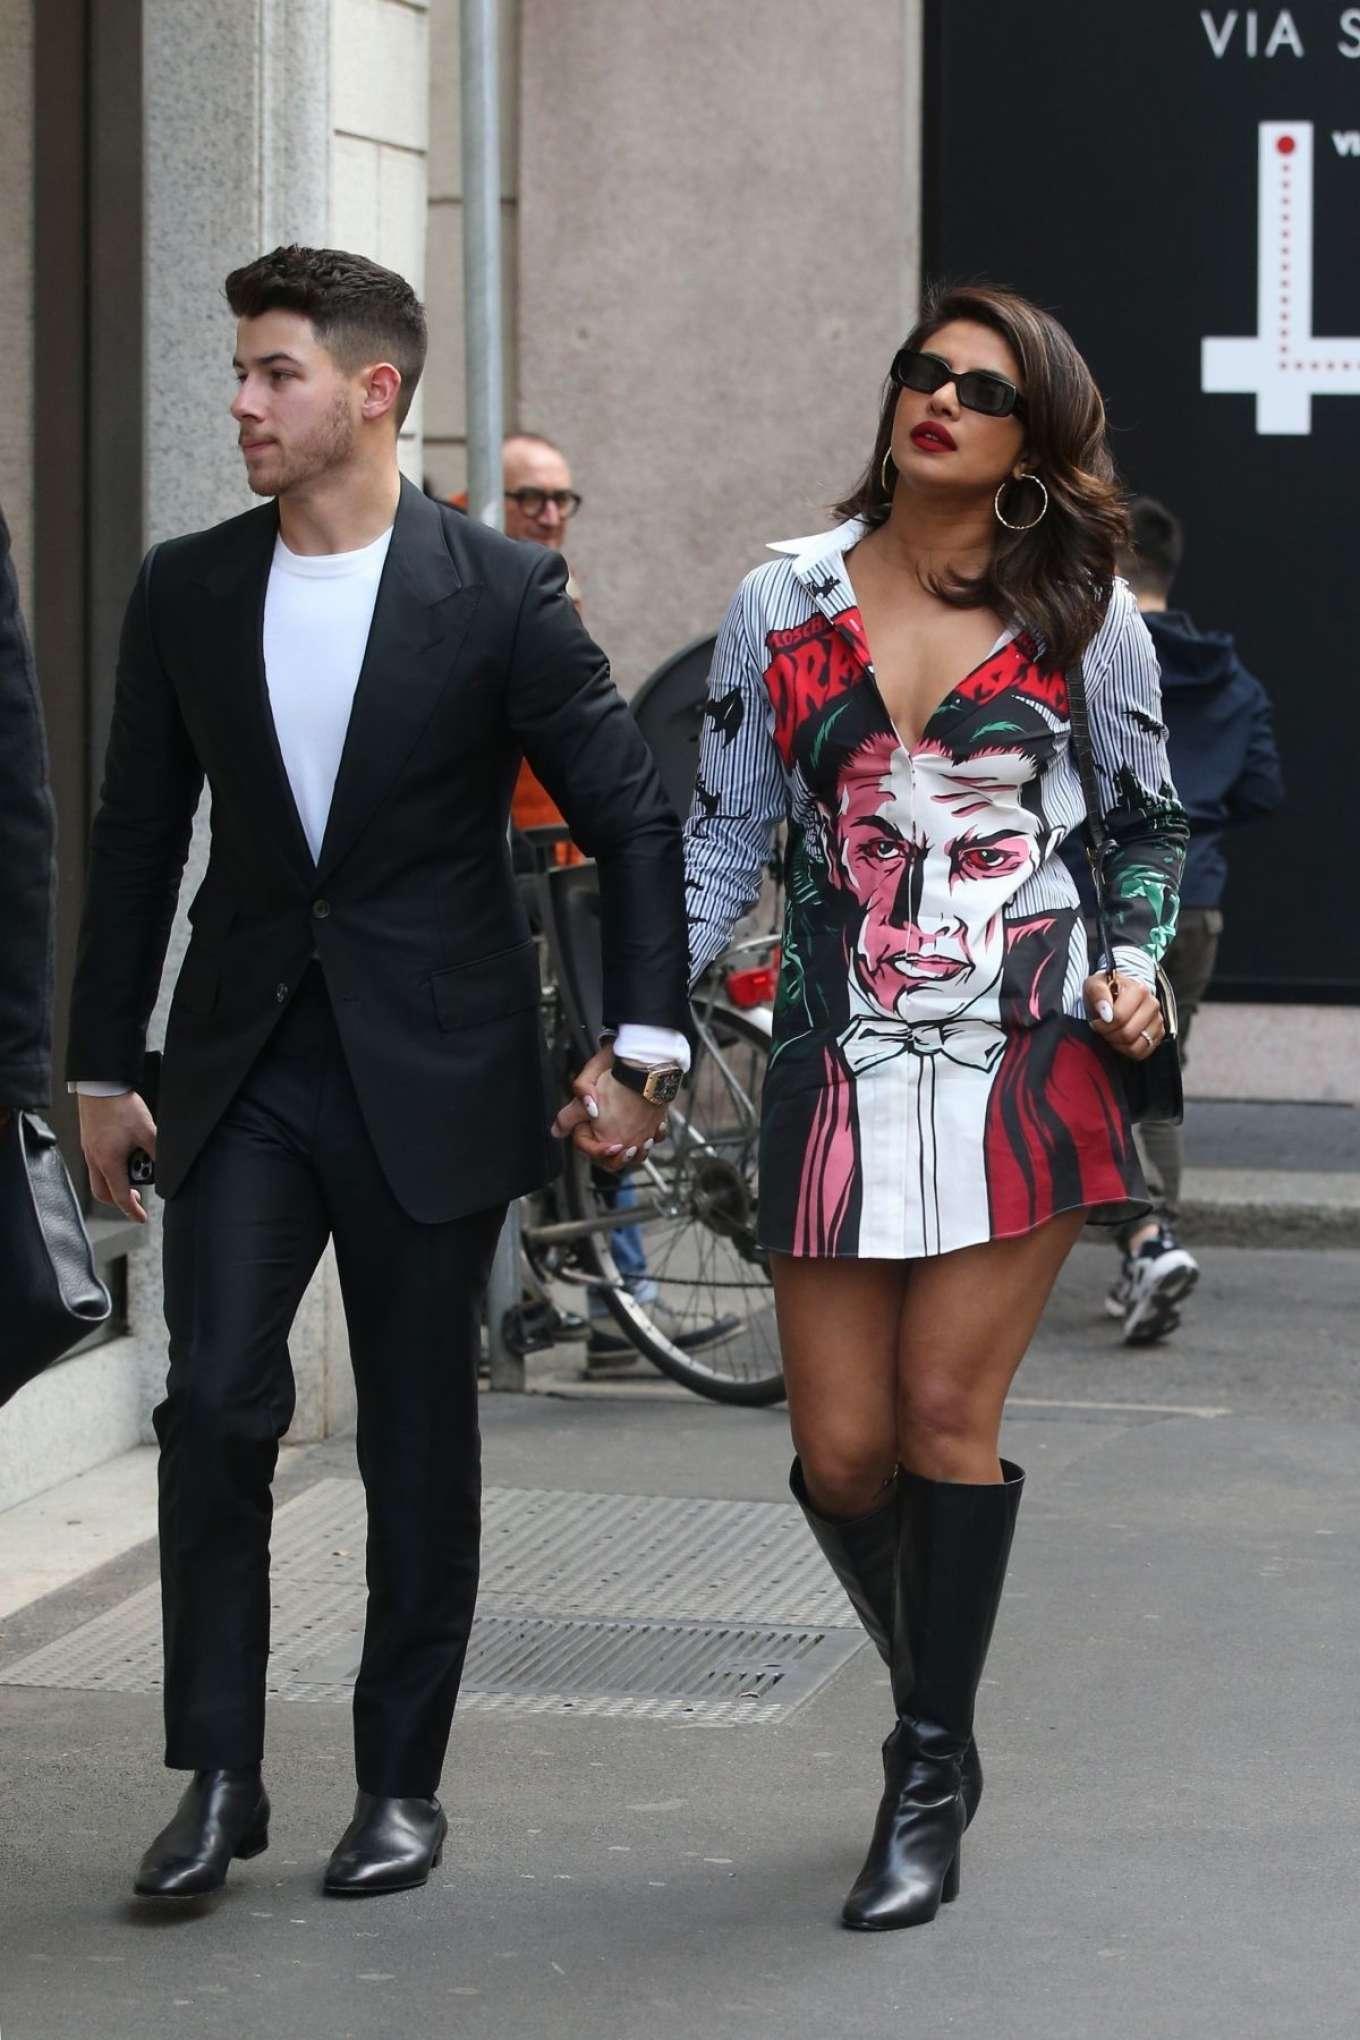 Priyanka Chopra wearing narrow black leather knee high boots with high heel